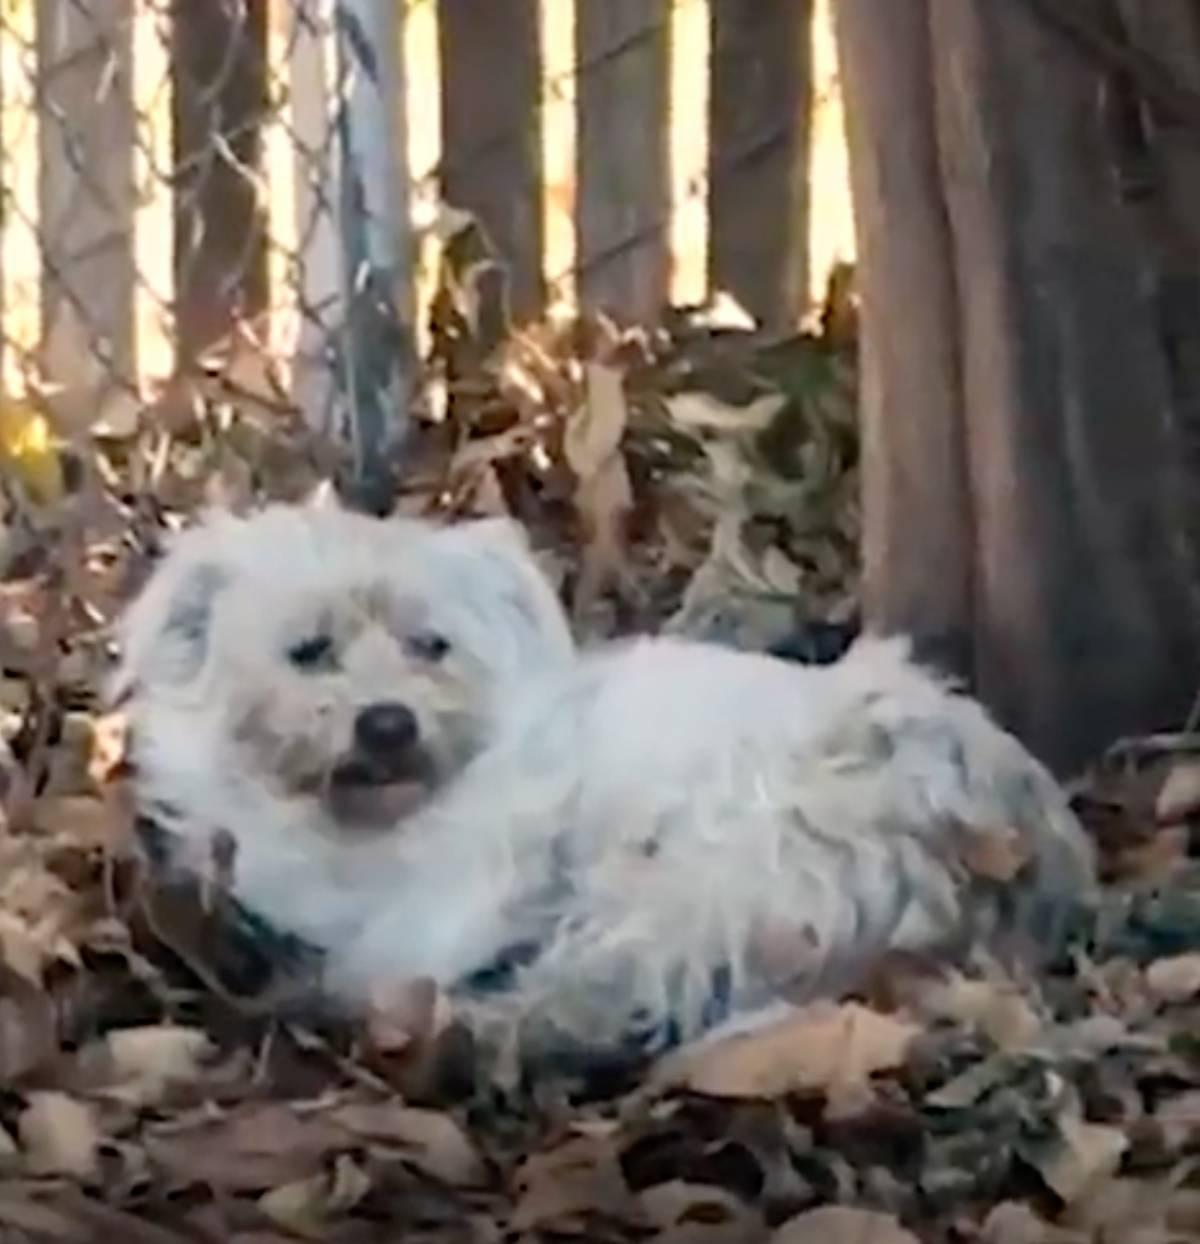 cane bianco seduto